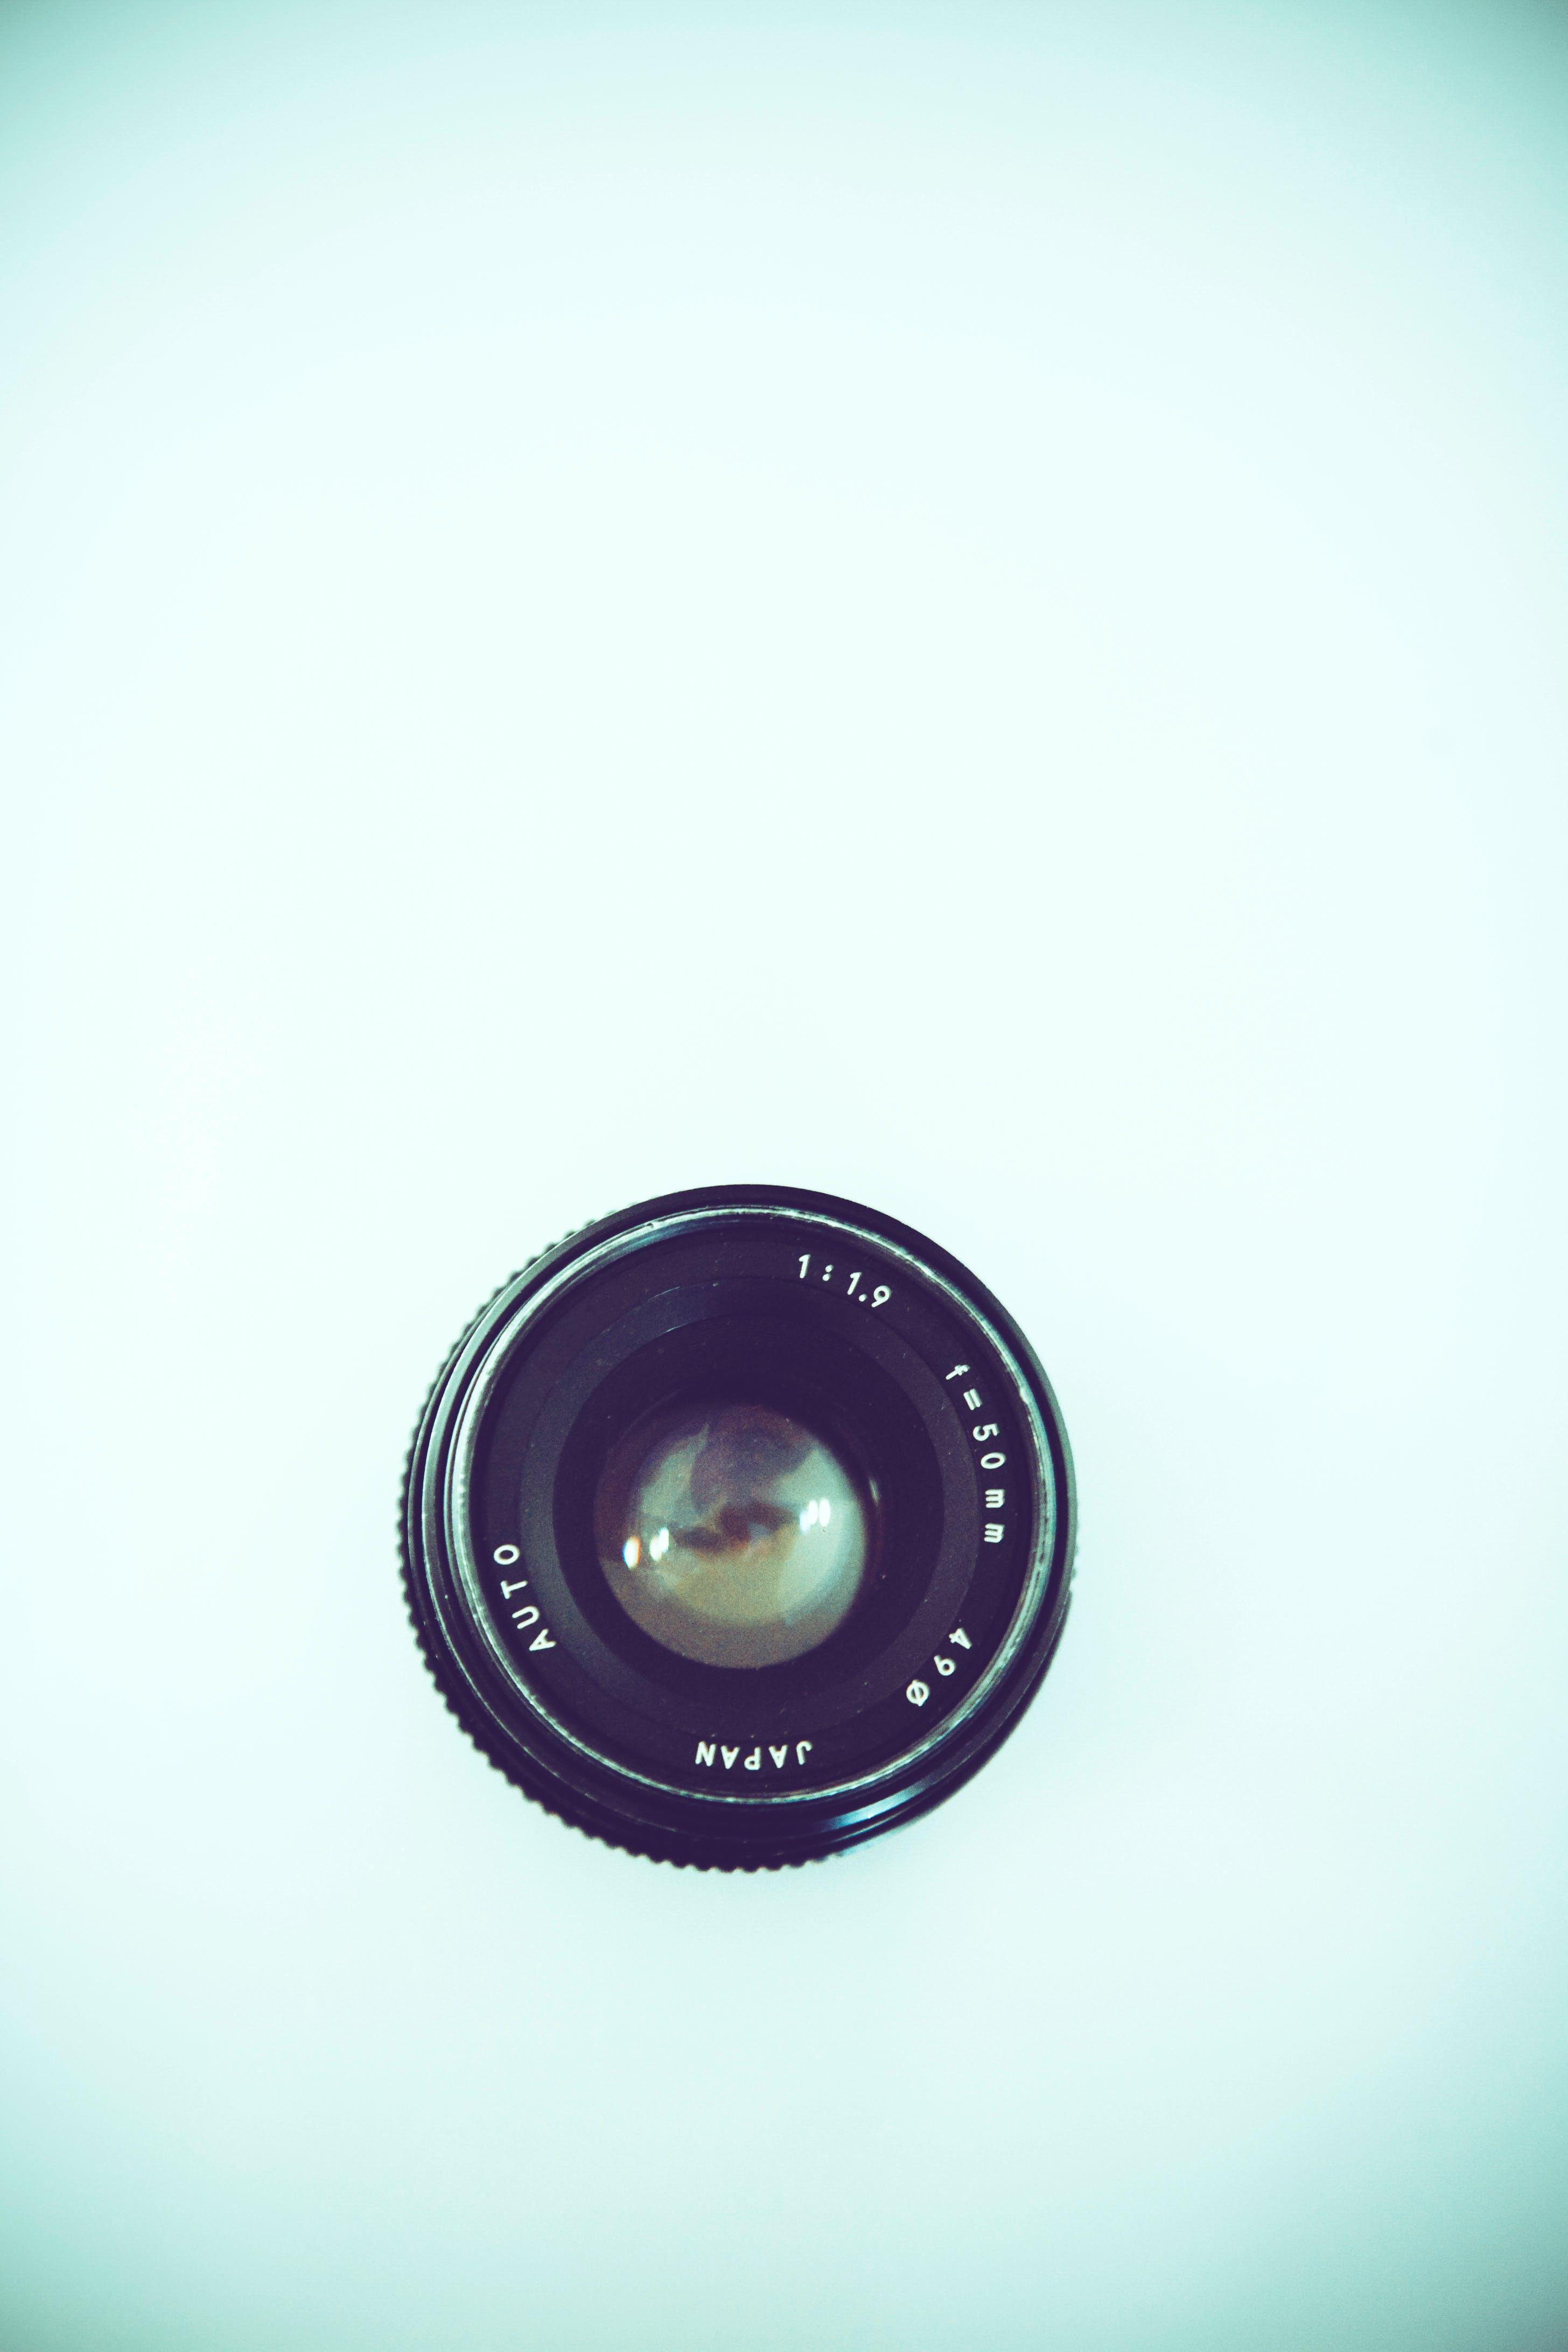 Gratis lagerfoto af fotografi, kameralinse, linse